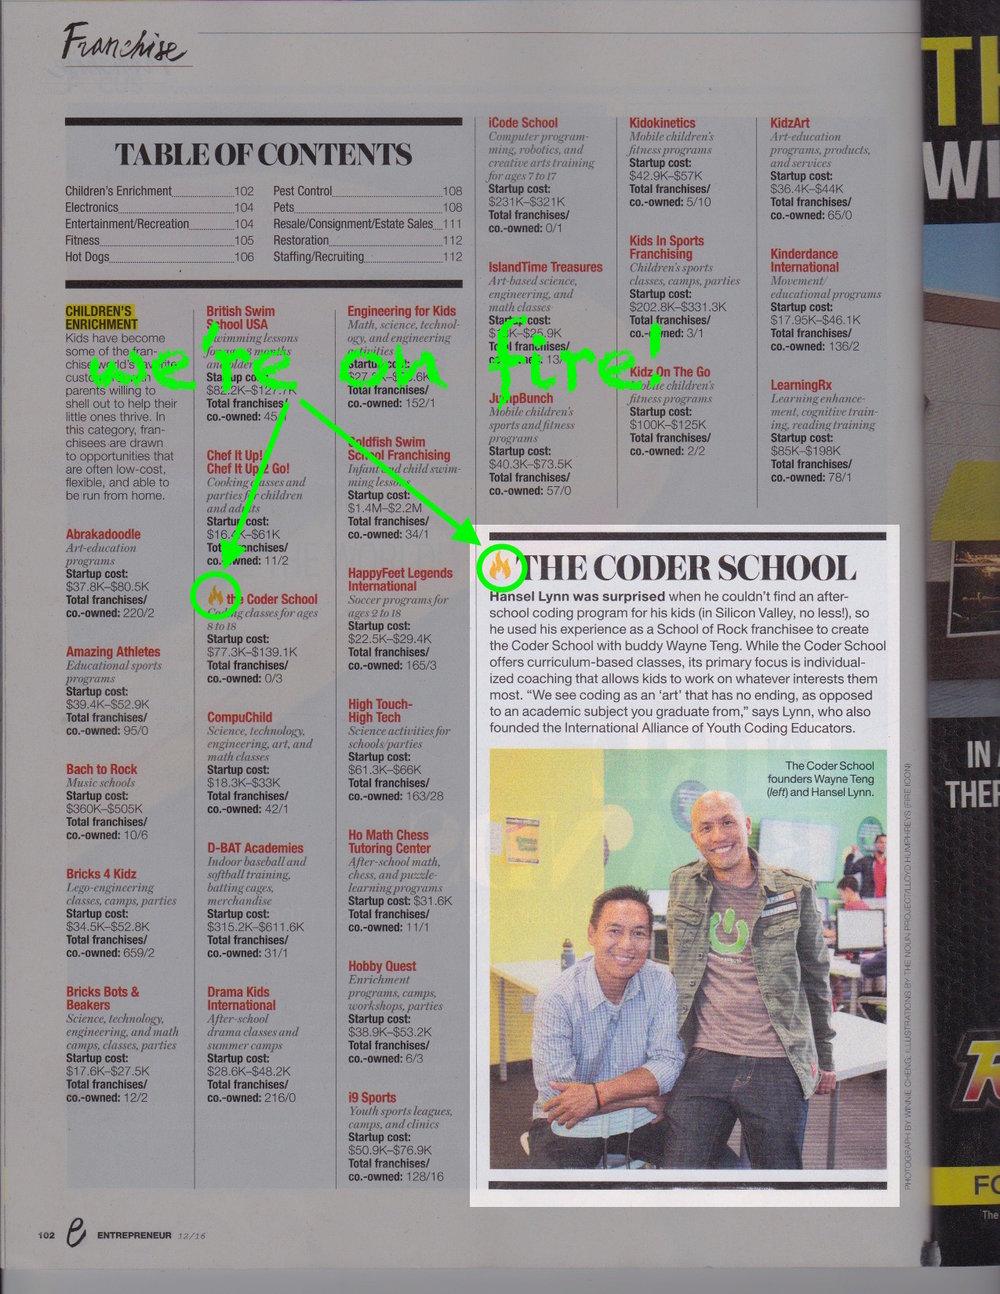 We're in Entrepreneur Magazine!